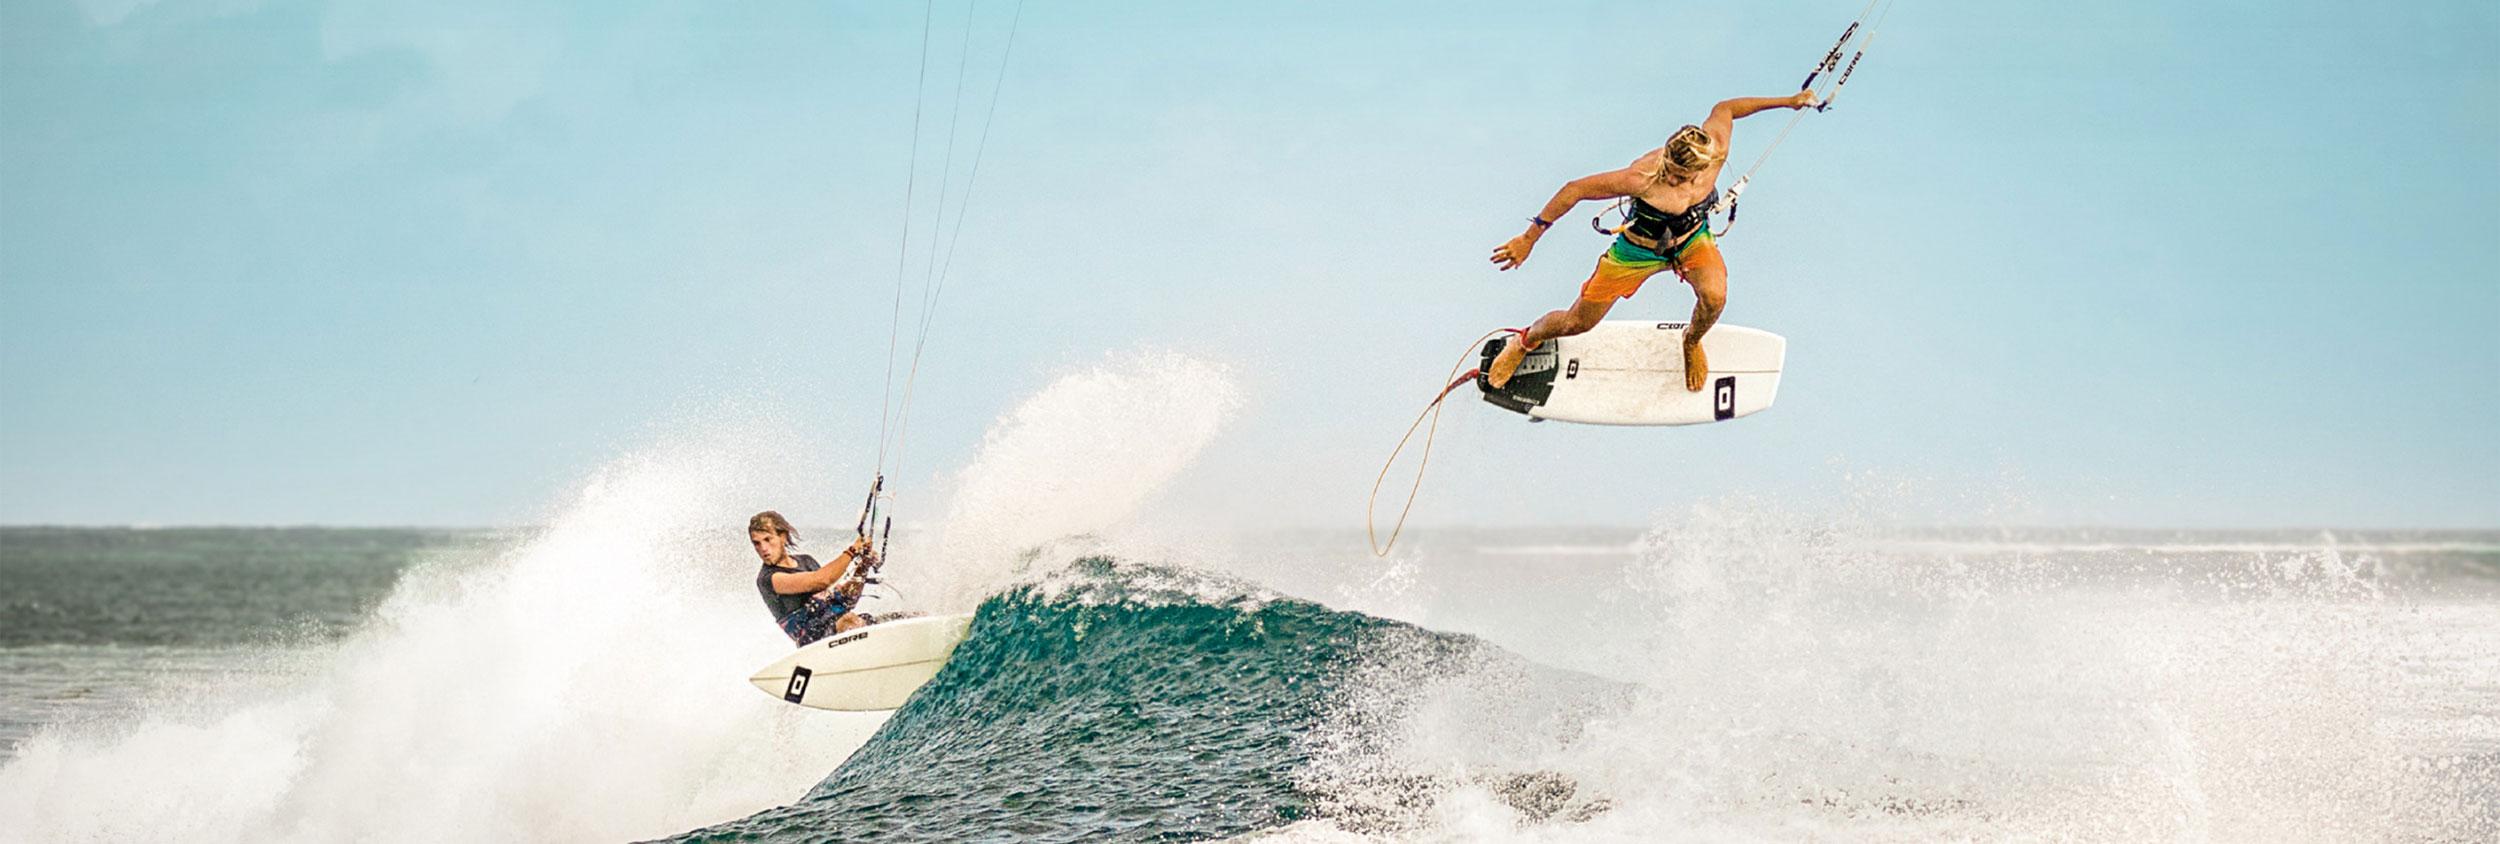 Core 2017 Surfboards